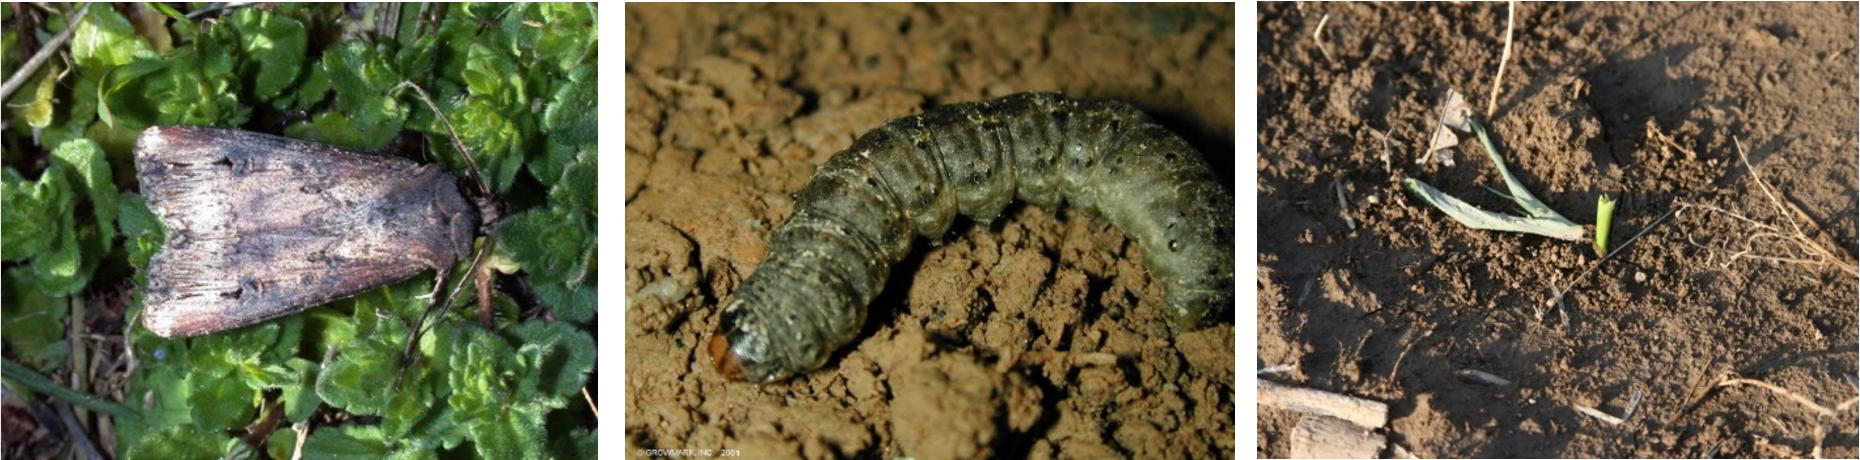 BlackCutwormAdult-Larvae_CornDamage.PNG